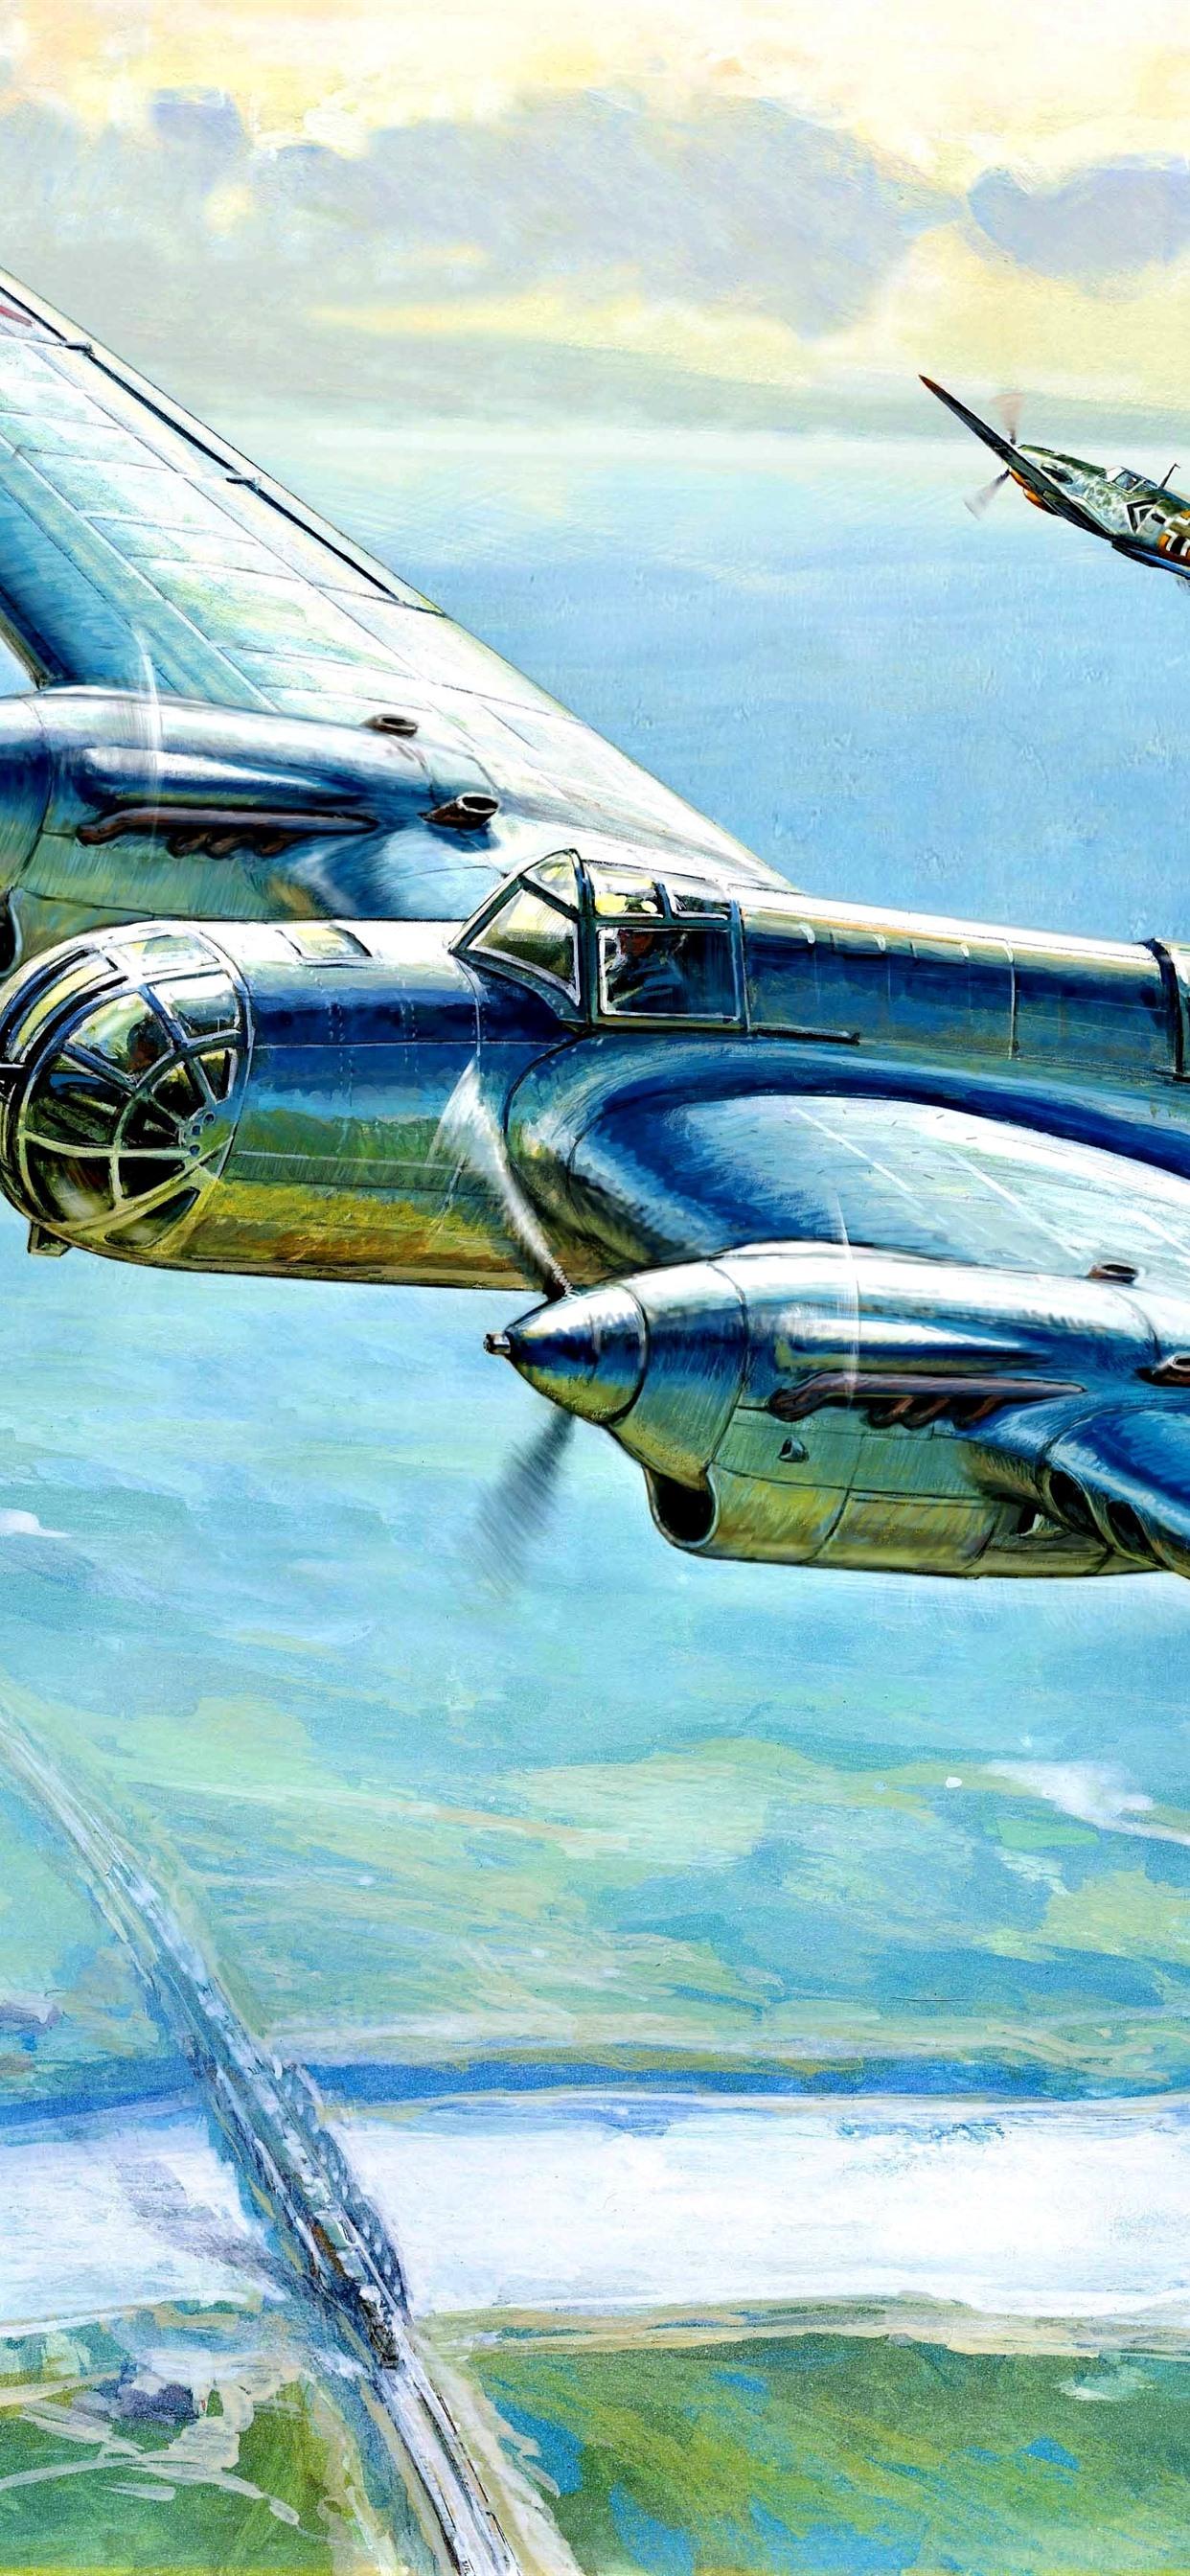 爆撃機 第二次世界大戦 アート絵画 1242x2688 Iphone 11 Pro Xs Max